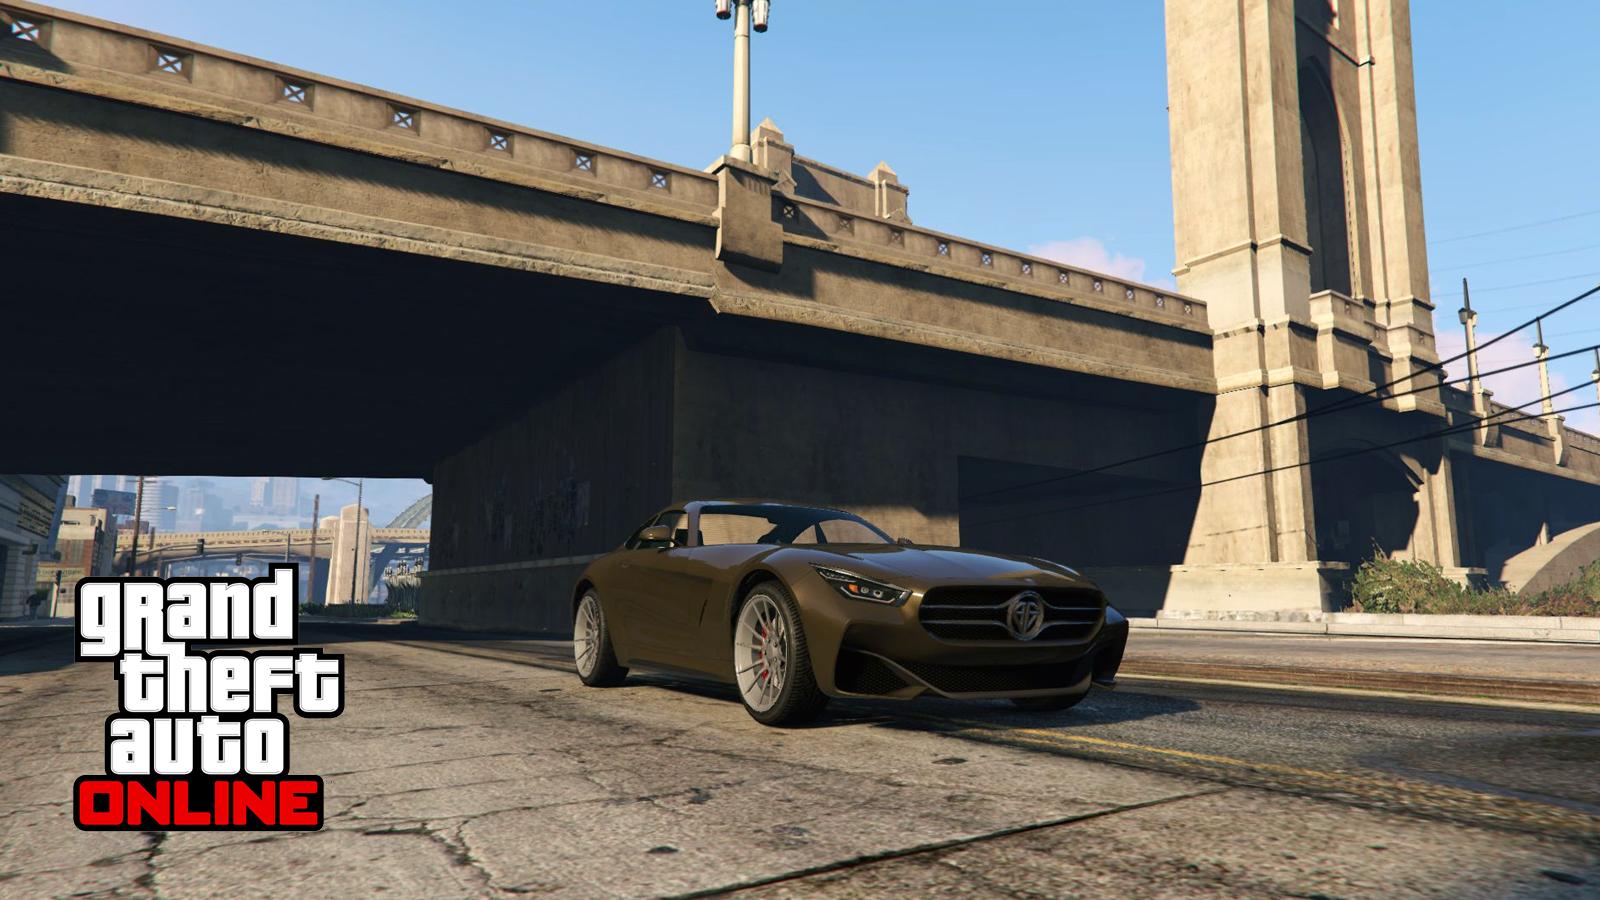 GTA Online Bridge Glitch